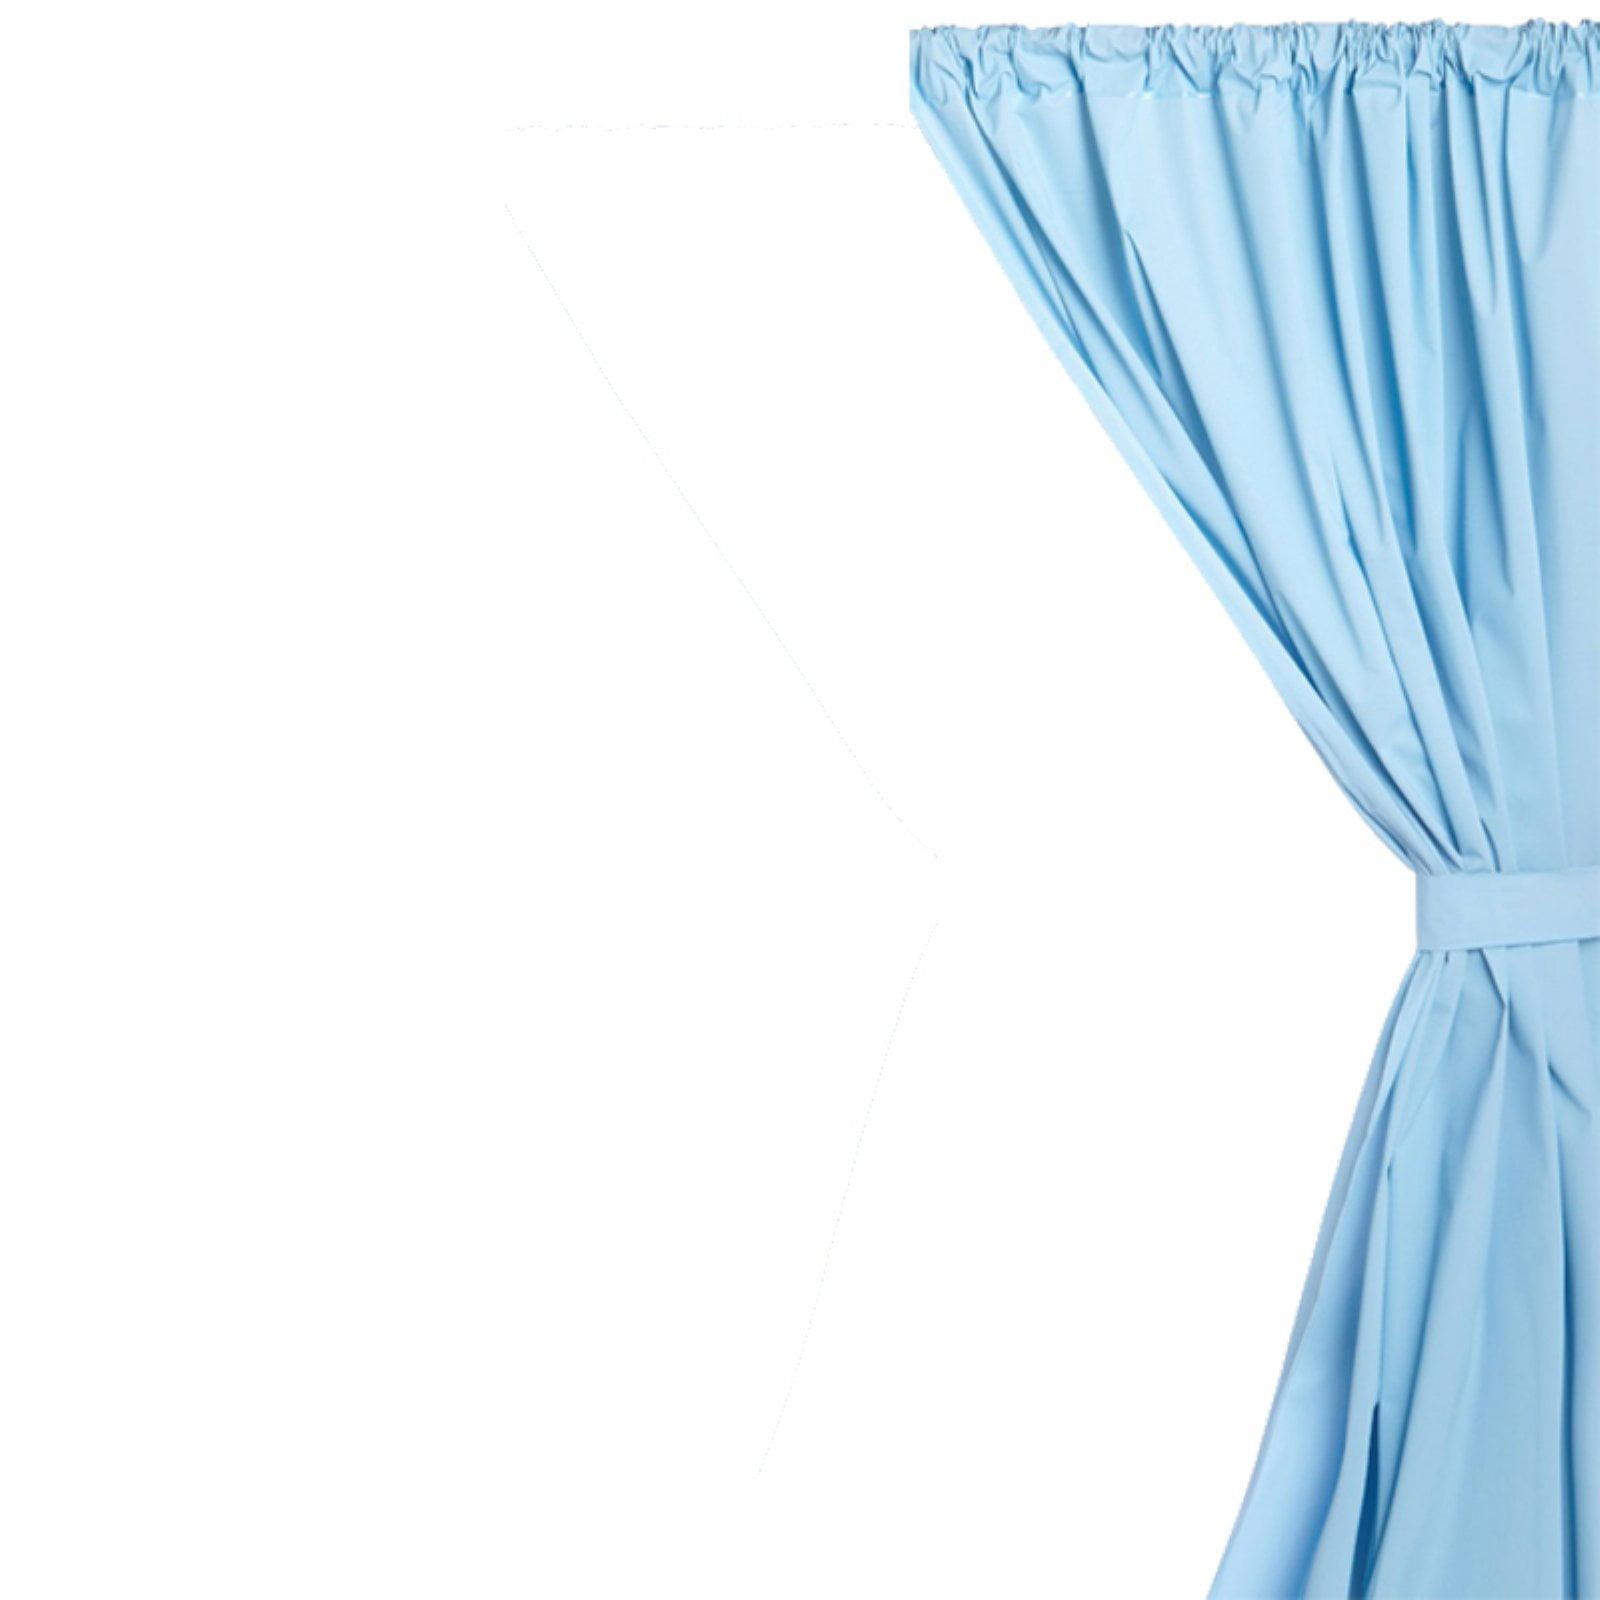 Vinyl Window Curtain In Light Blue